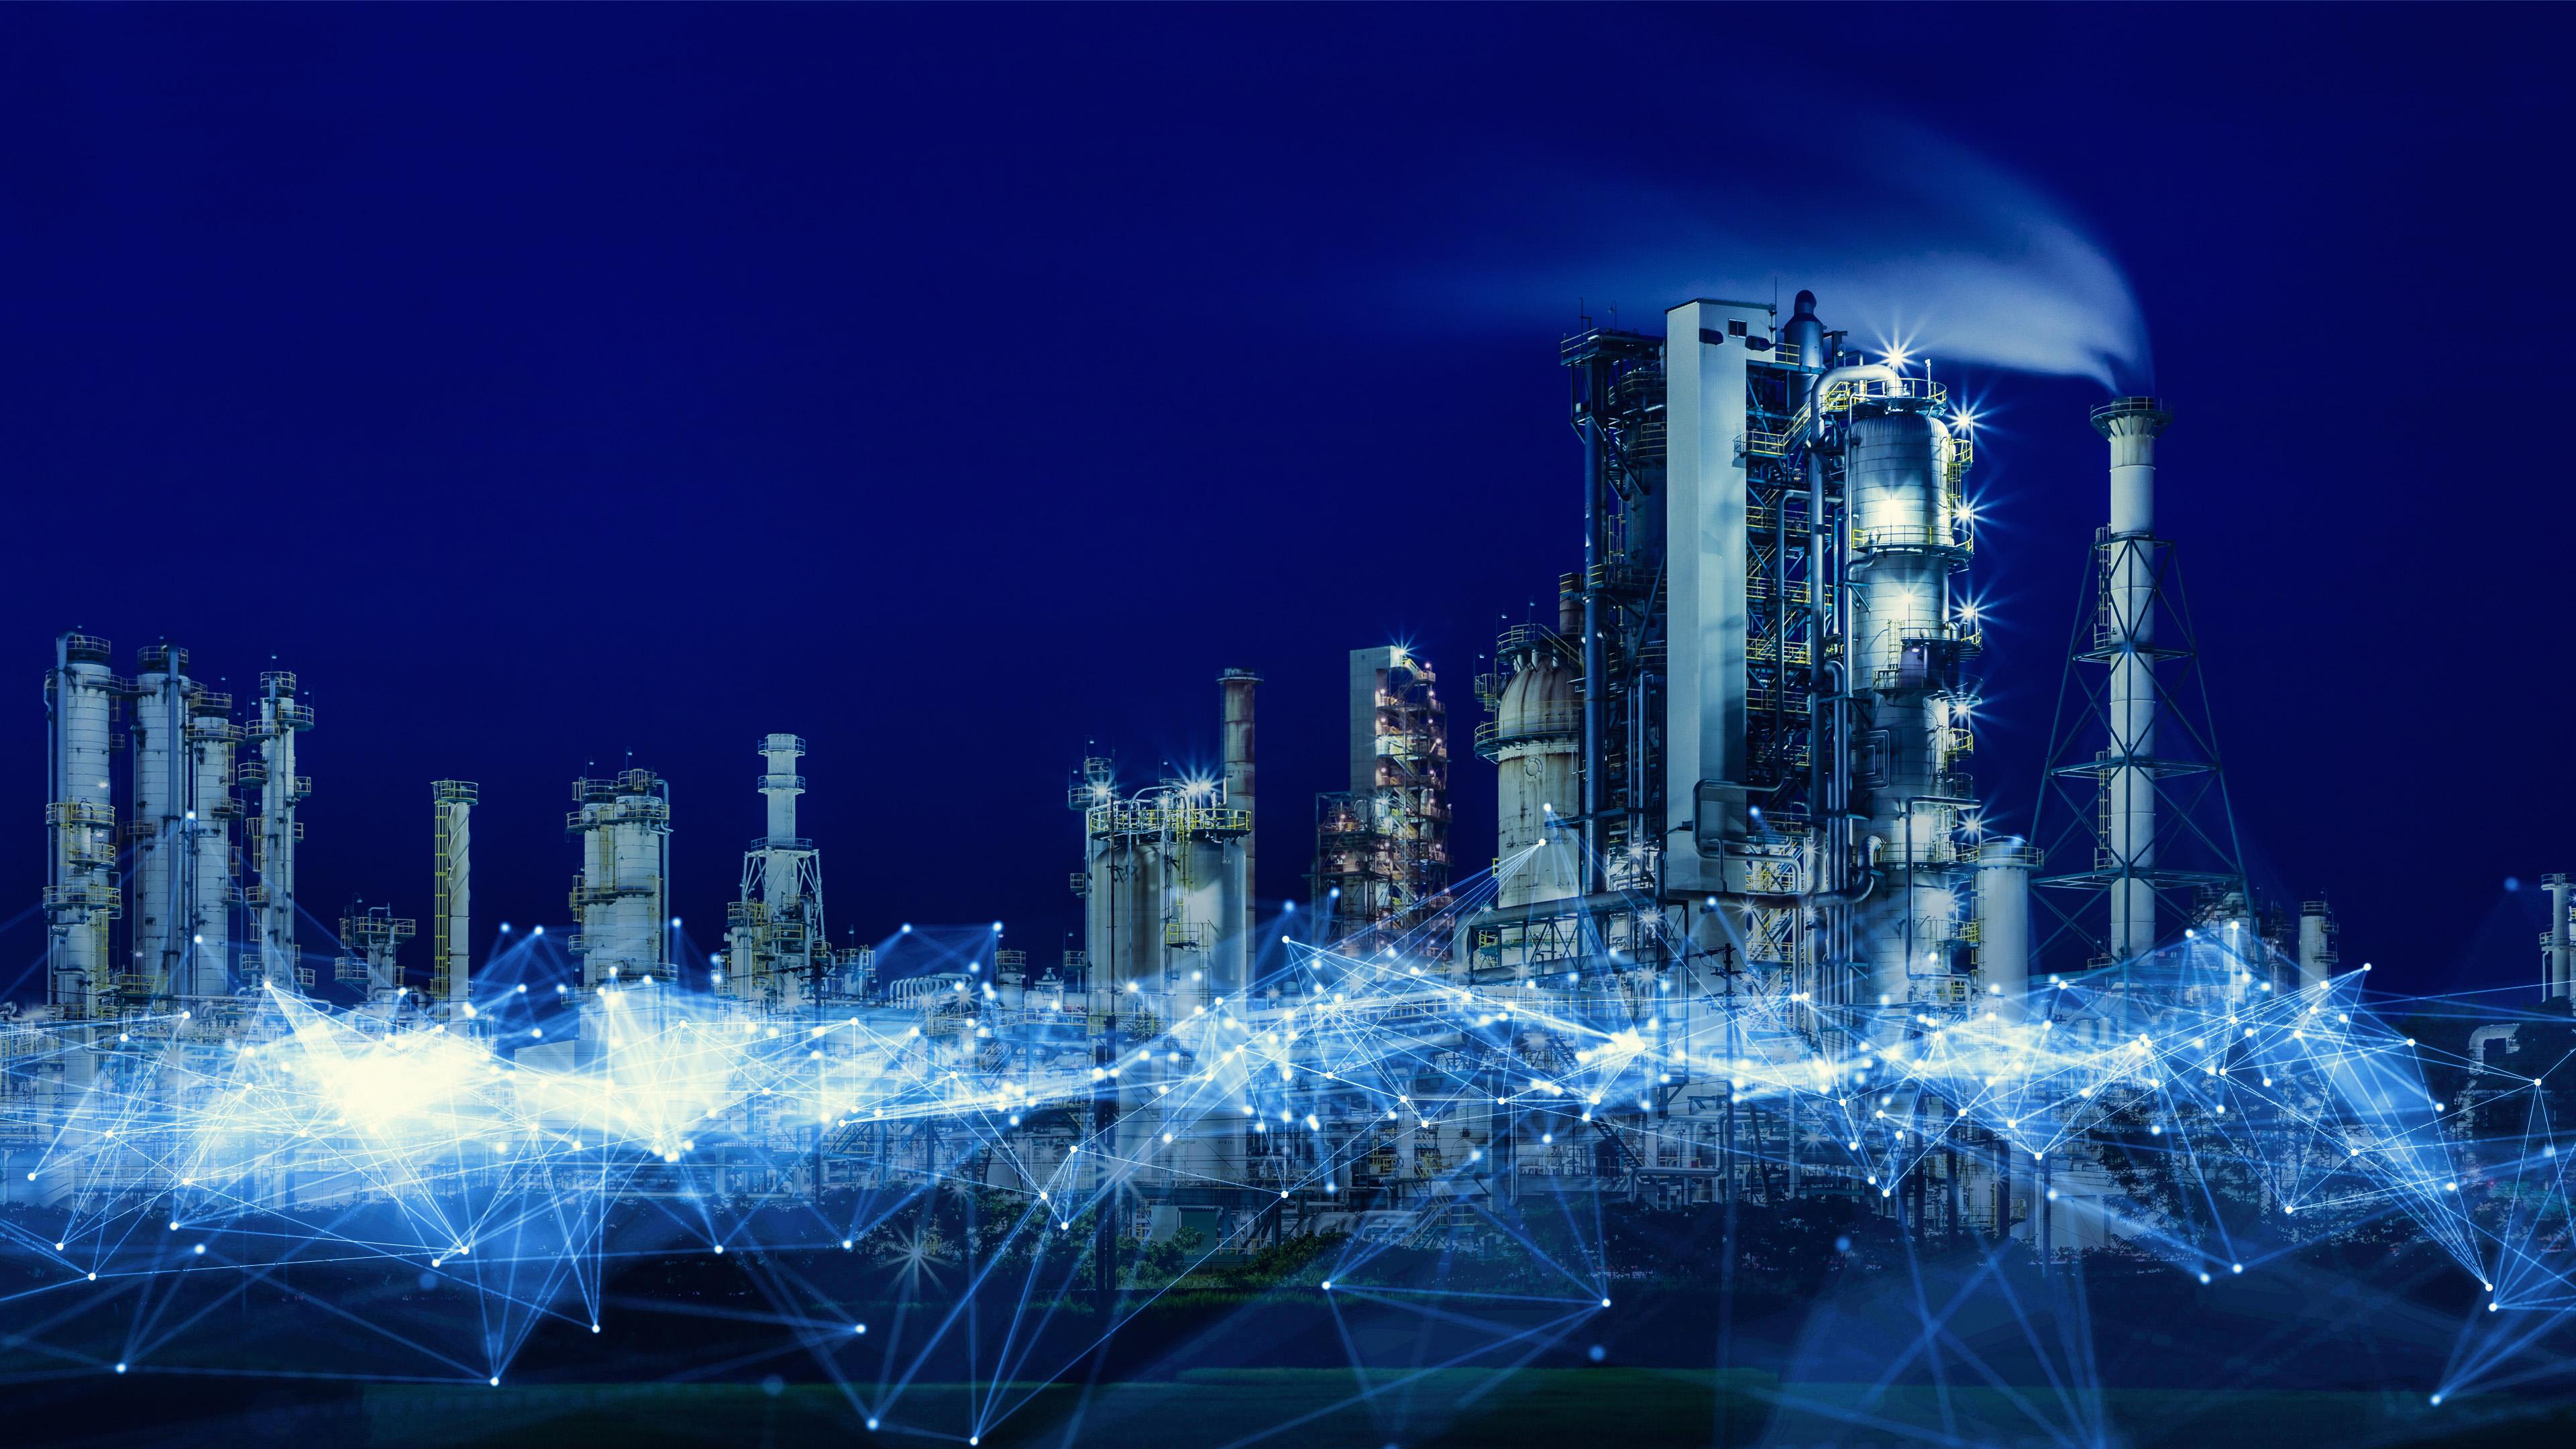 5G Digital Smart Factory